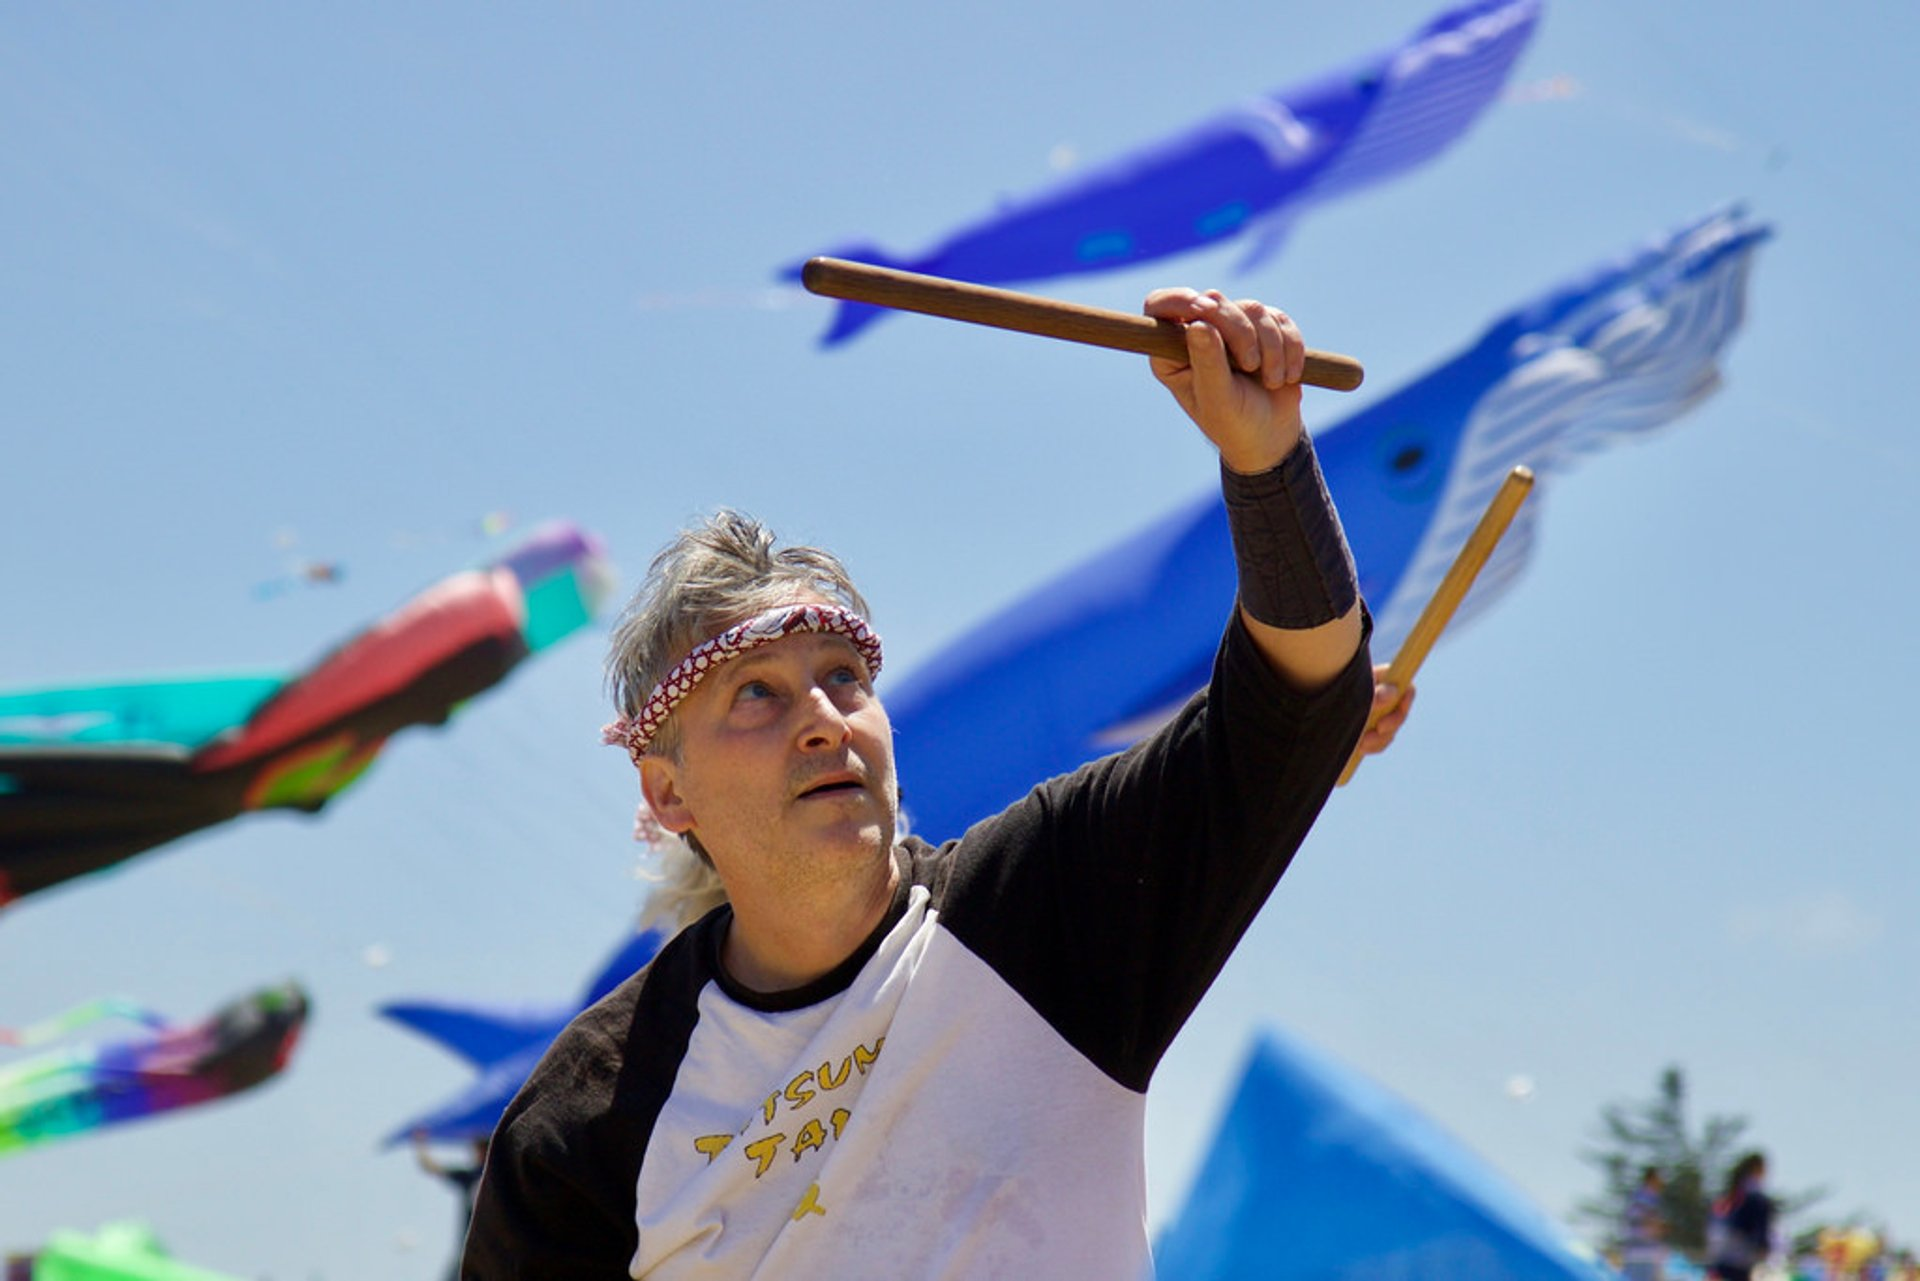 Best time for Berkeley Kite Festival in San Francisco 2020